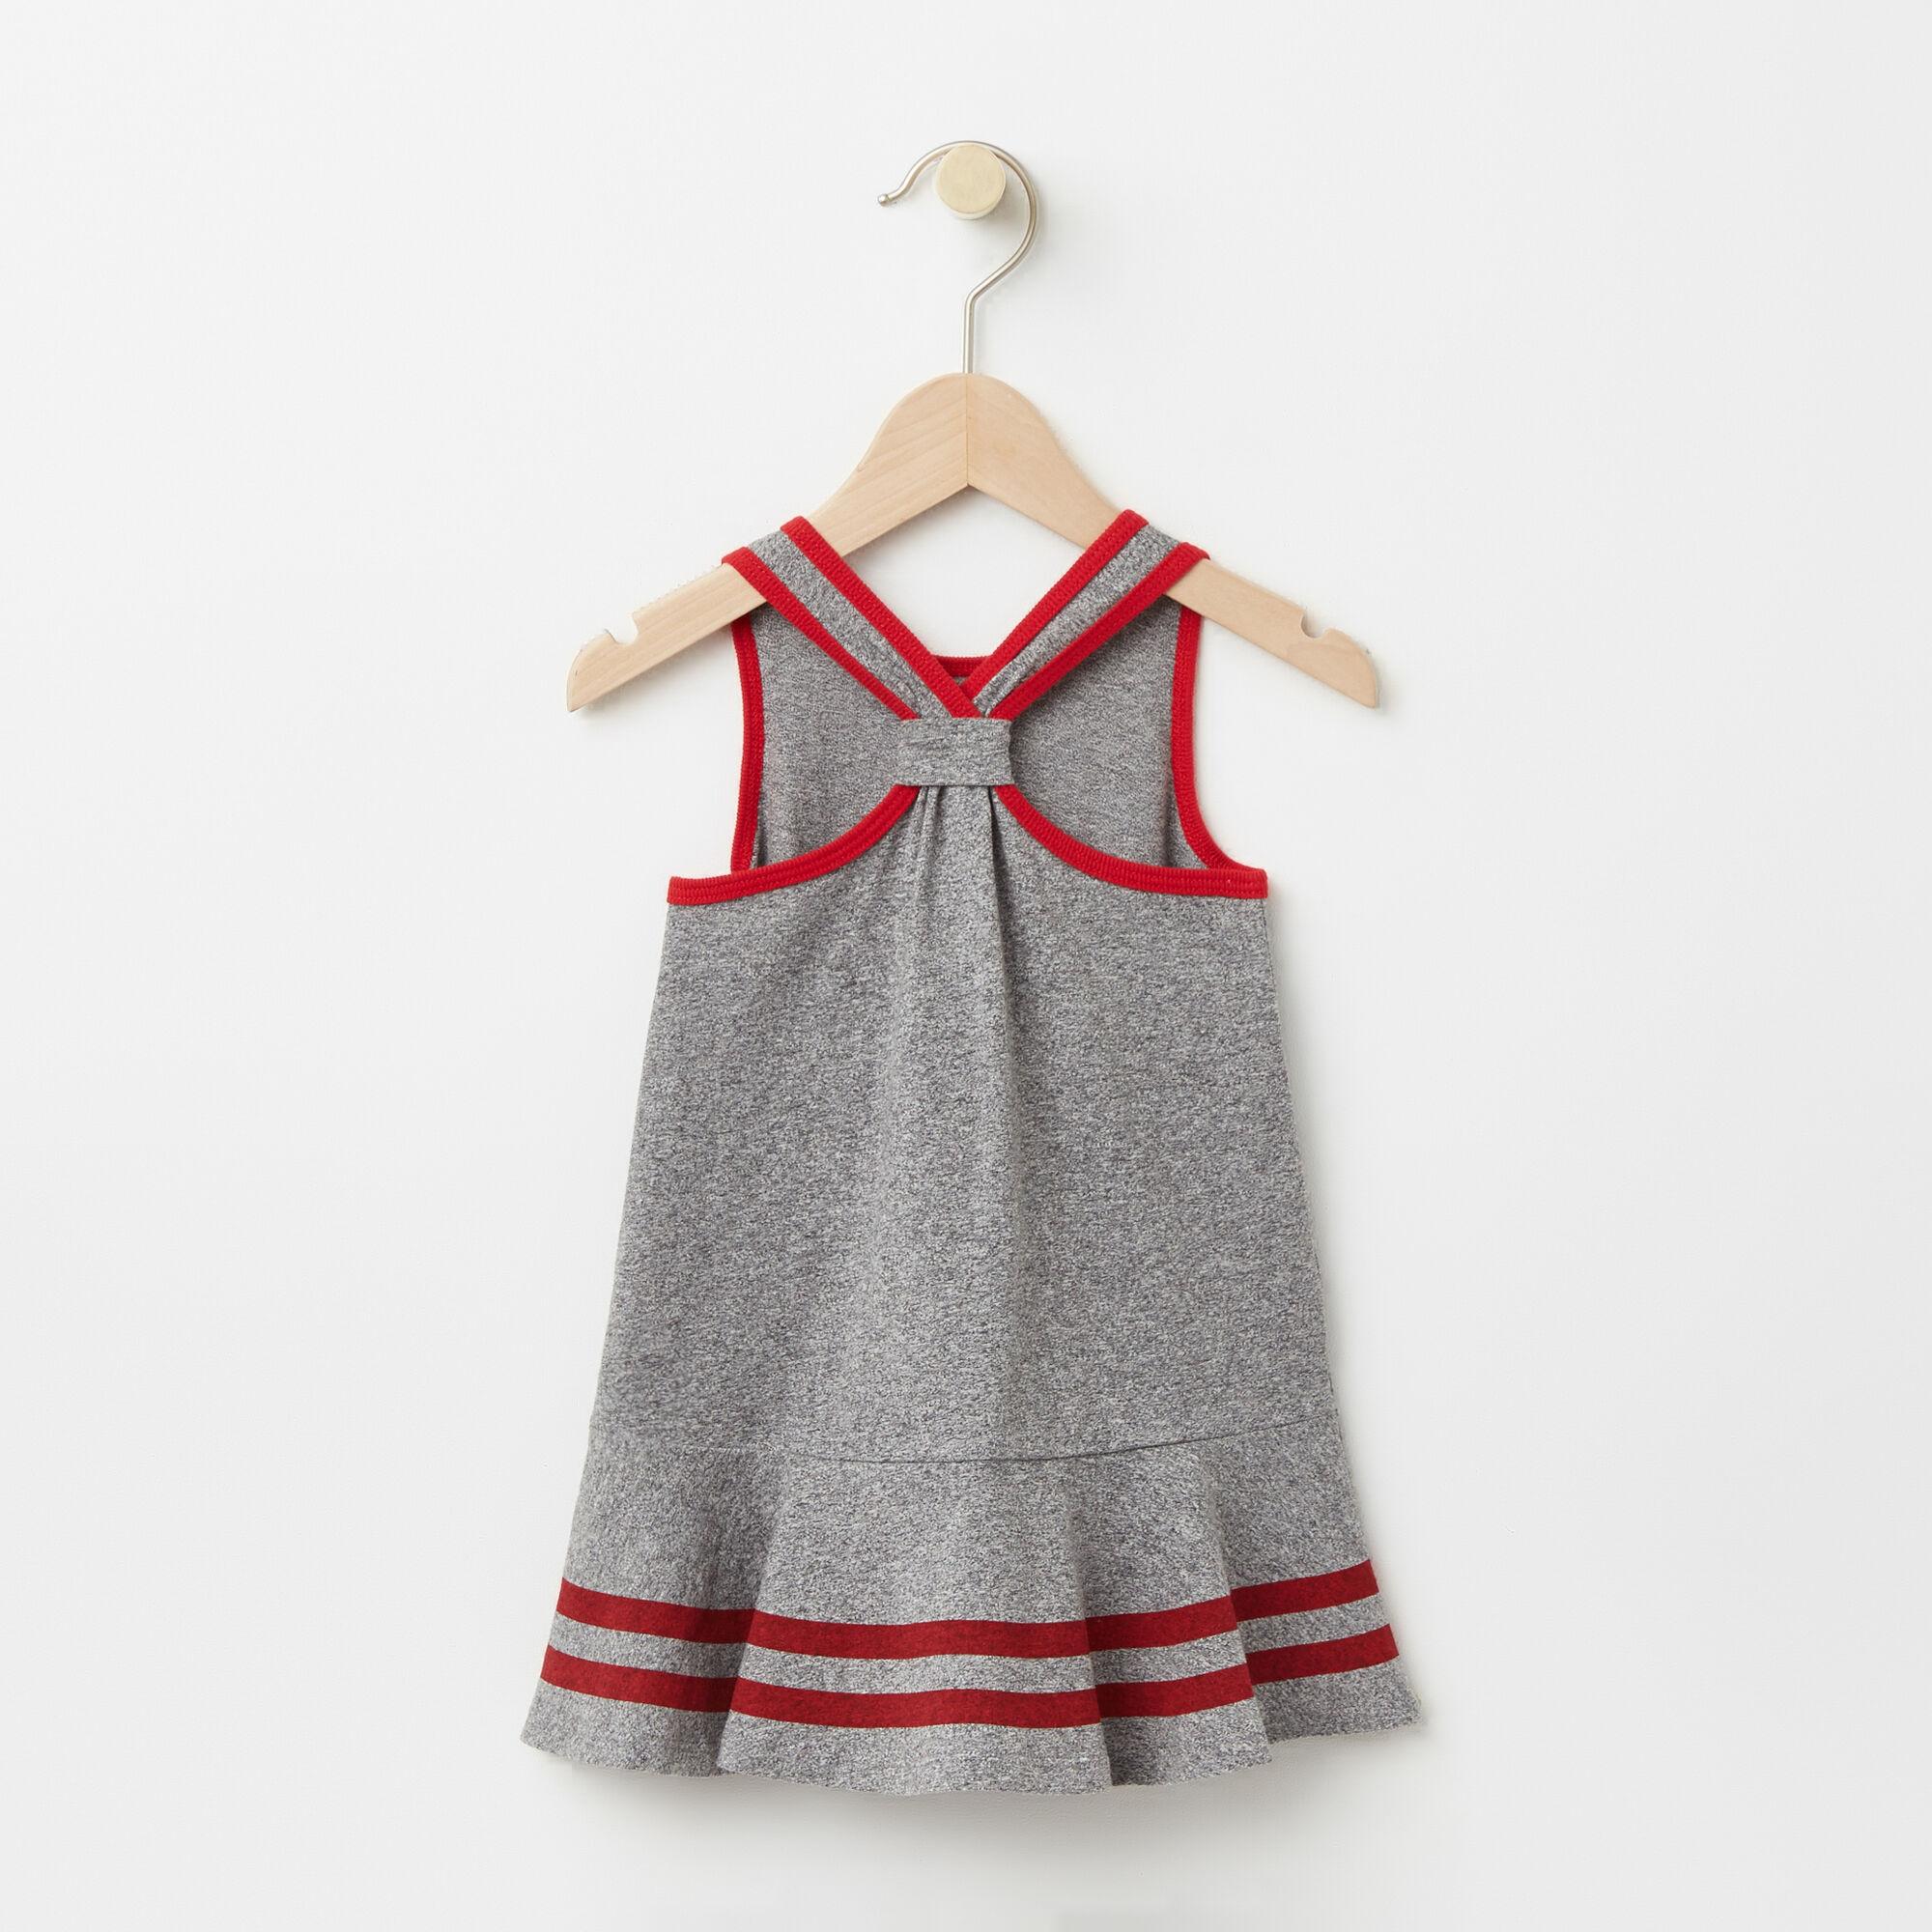 Bébés Robe Camisole Cooper Canada